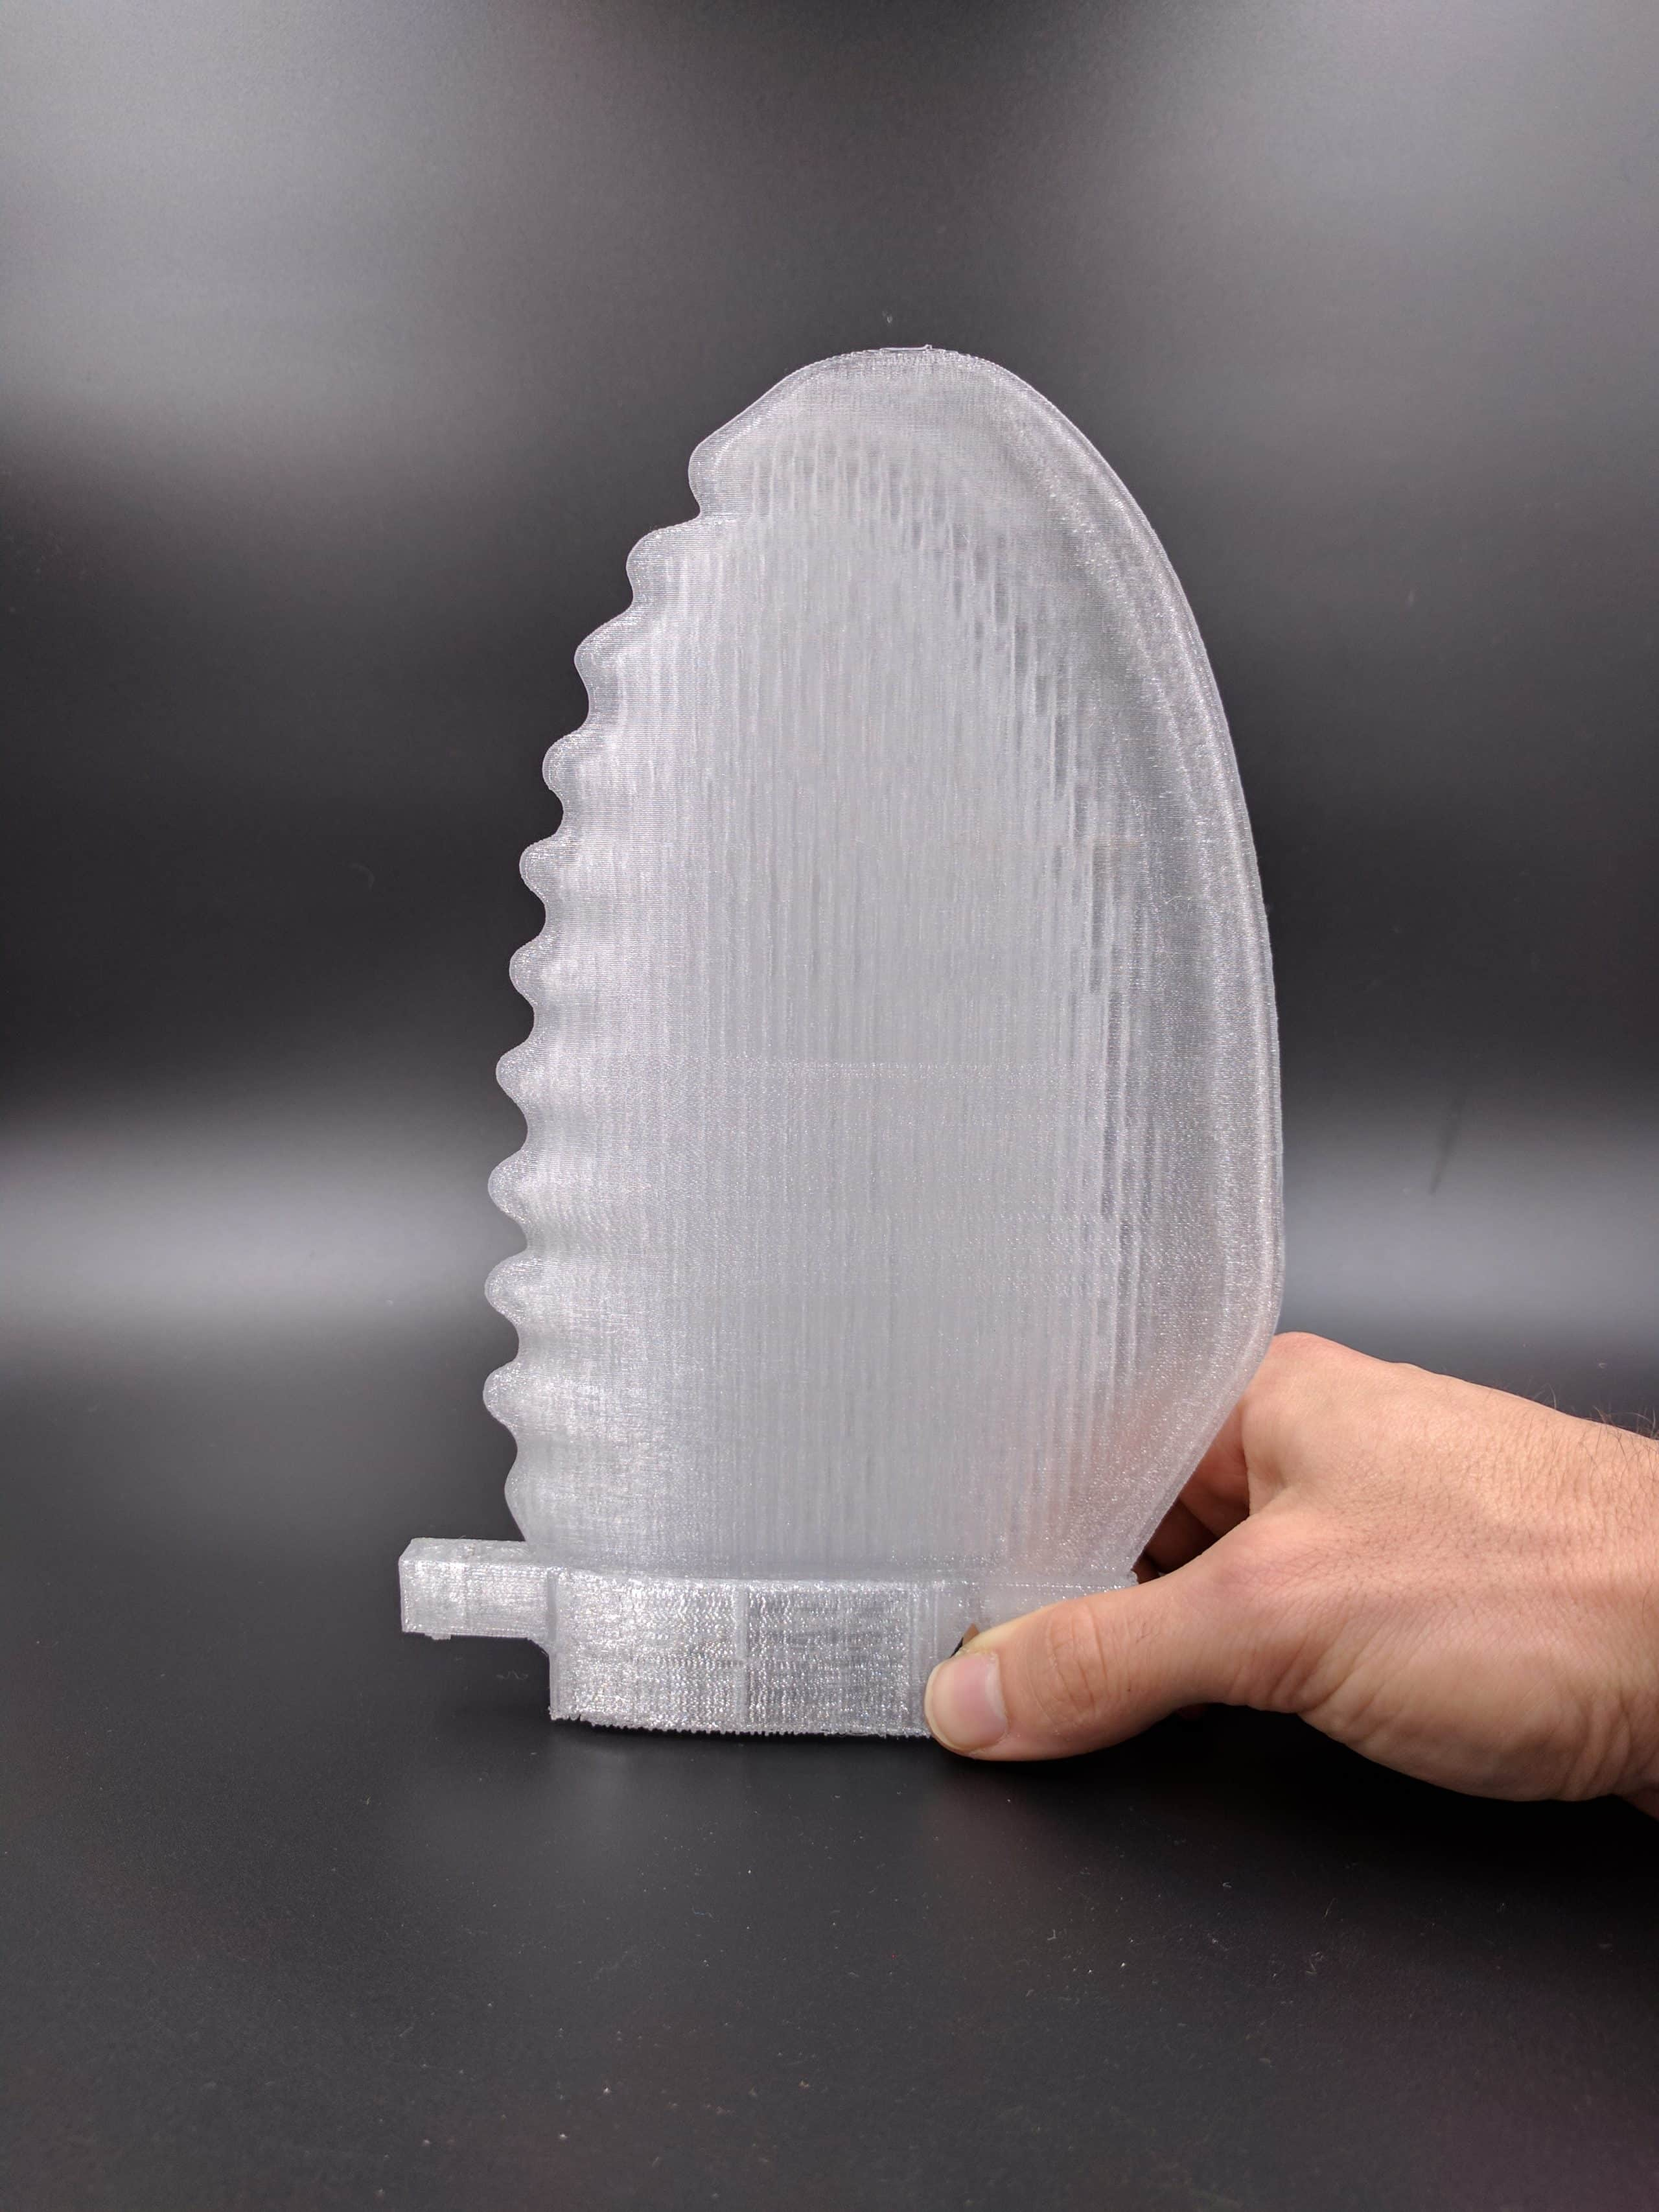 3D Printing FDM Translucent Polycarbonate PC Surfboard fin 4